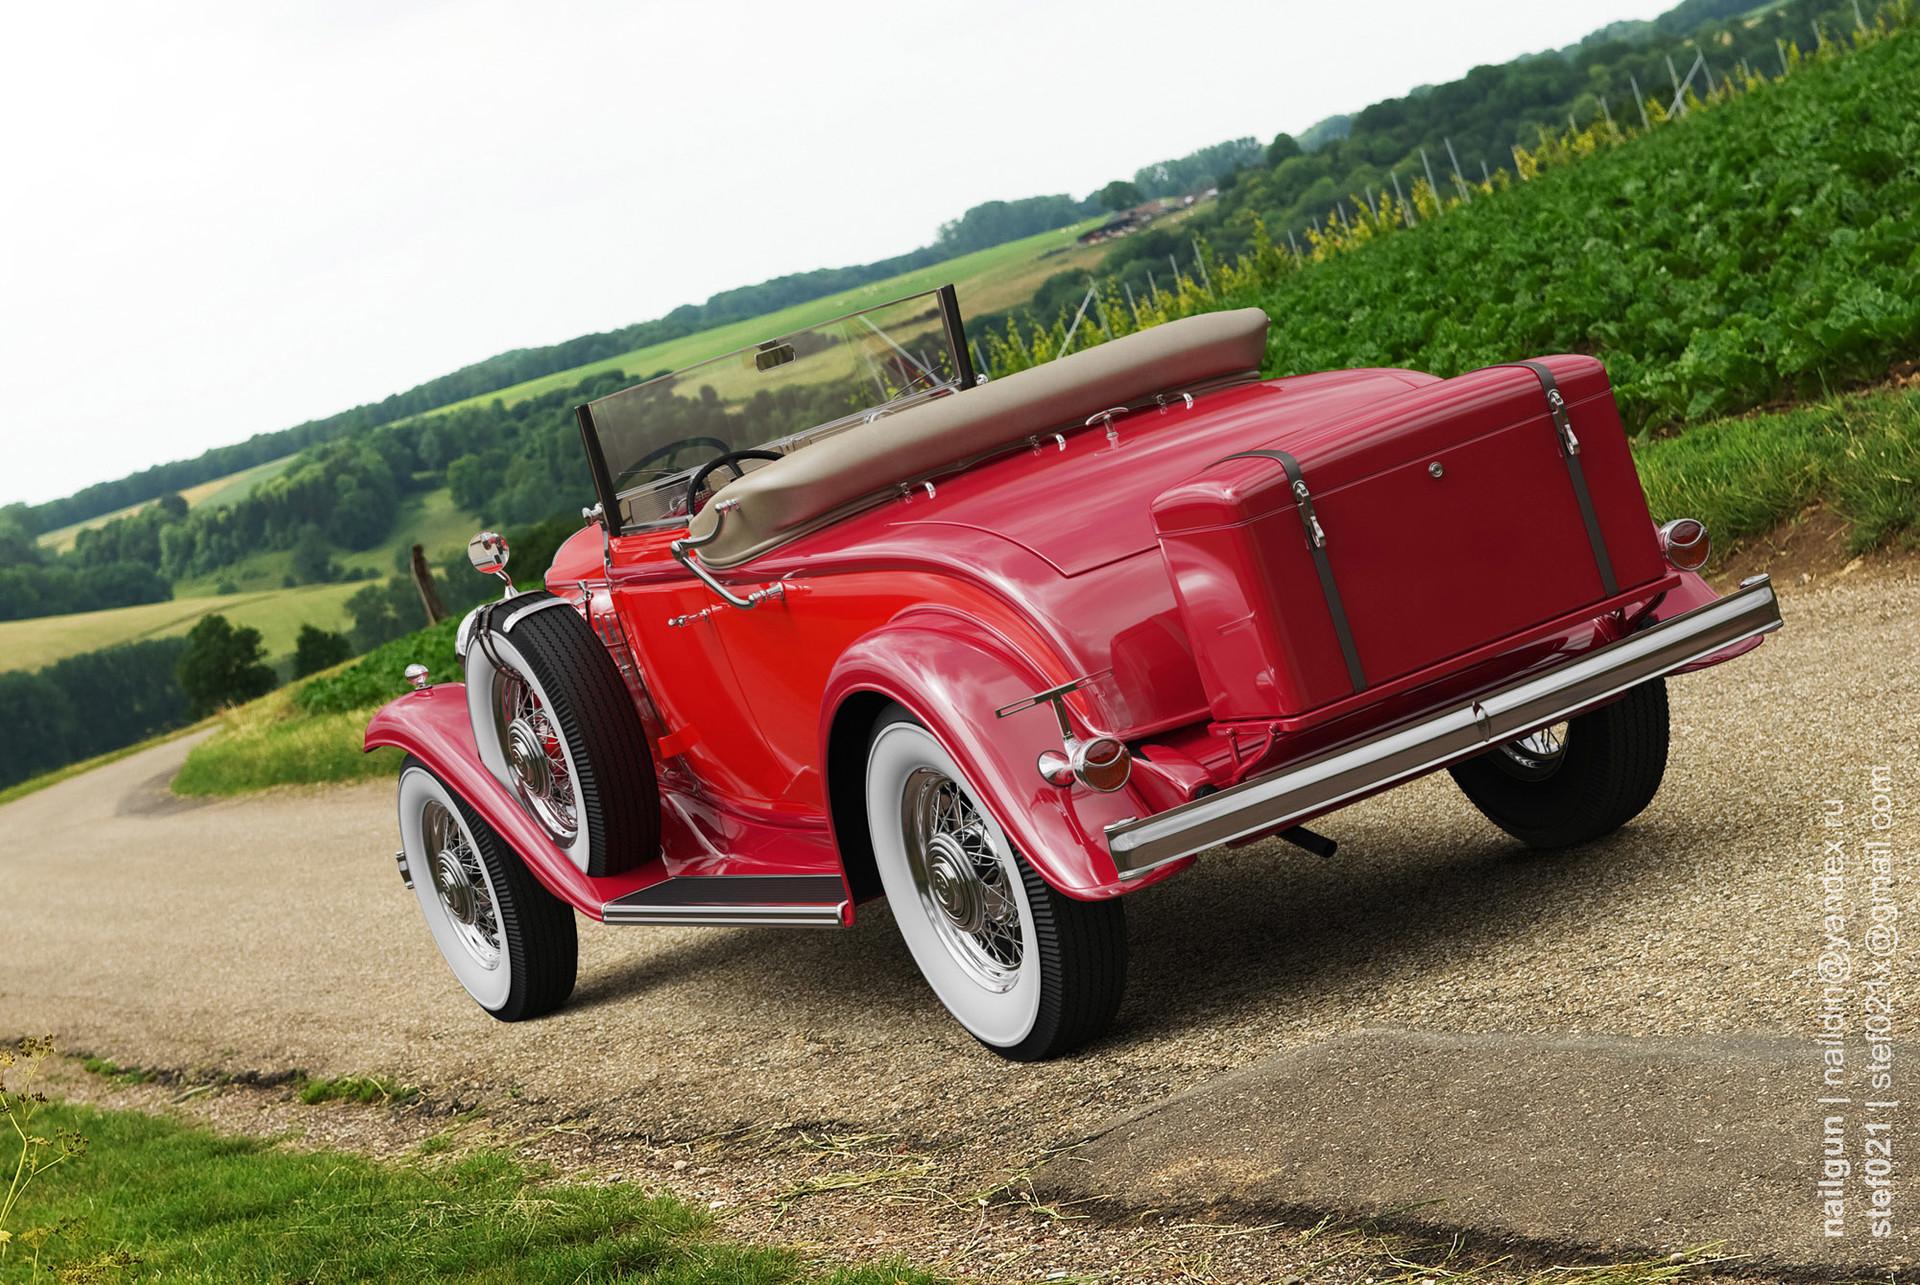 Nail khusnutdinov a0002 buick 96s 1932 roof down back rox